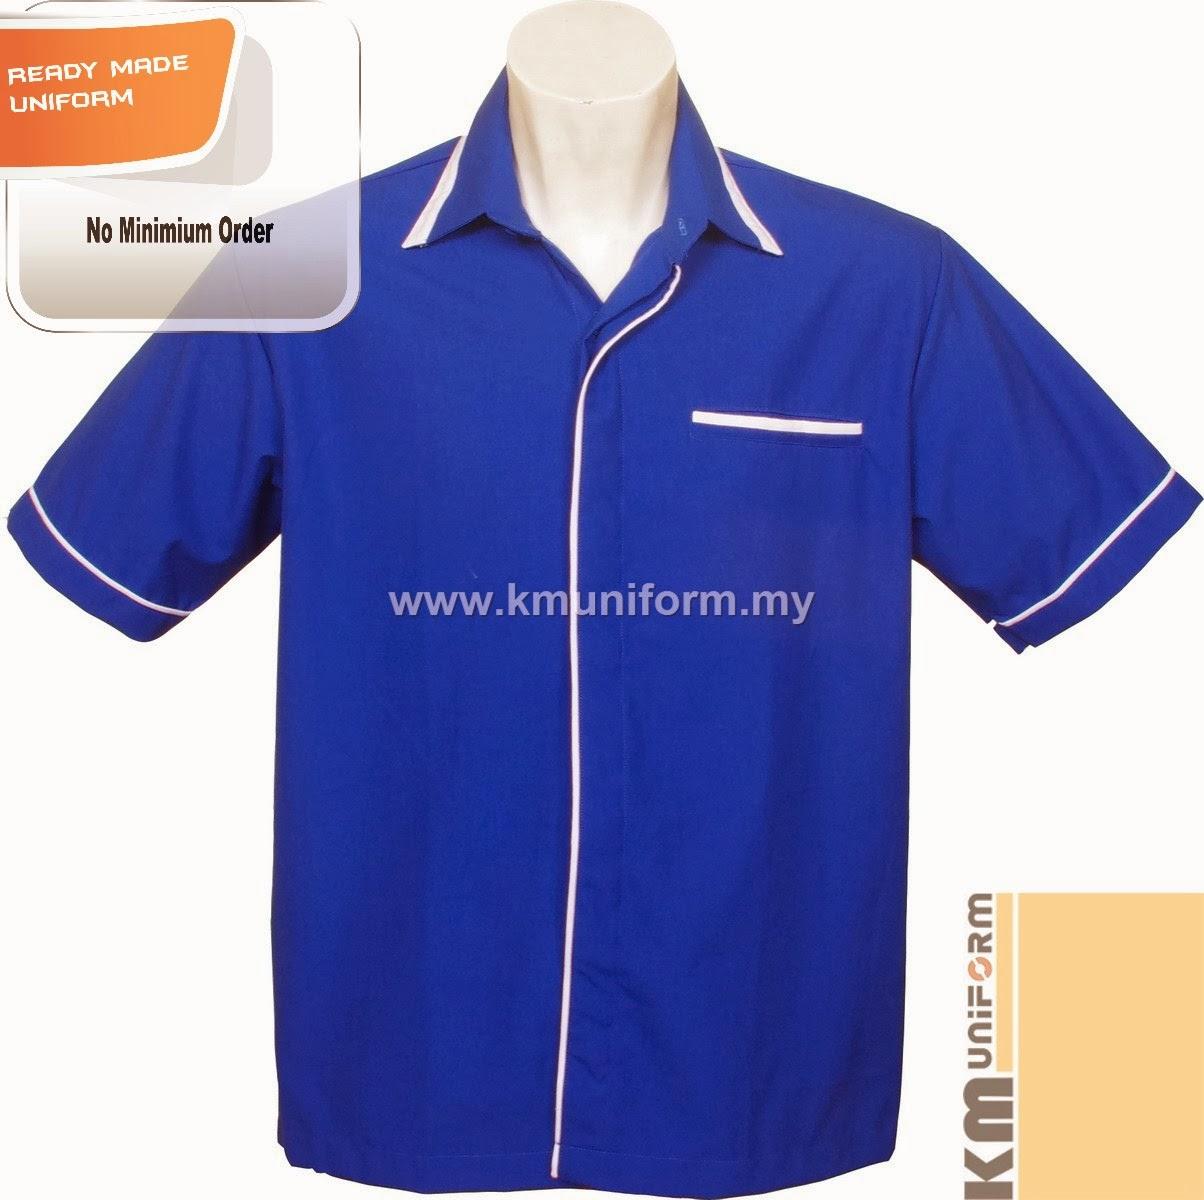 Shirt design malaysia - F1 Shirt Uniform